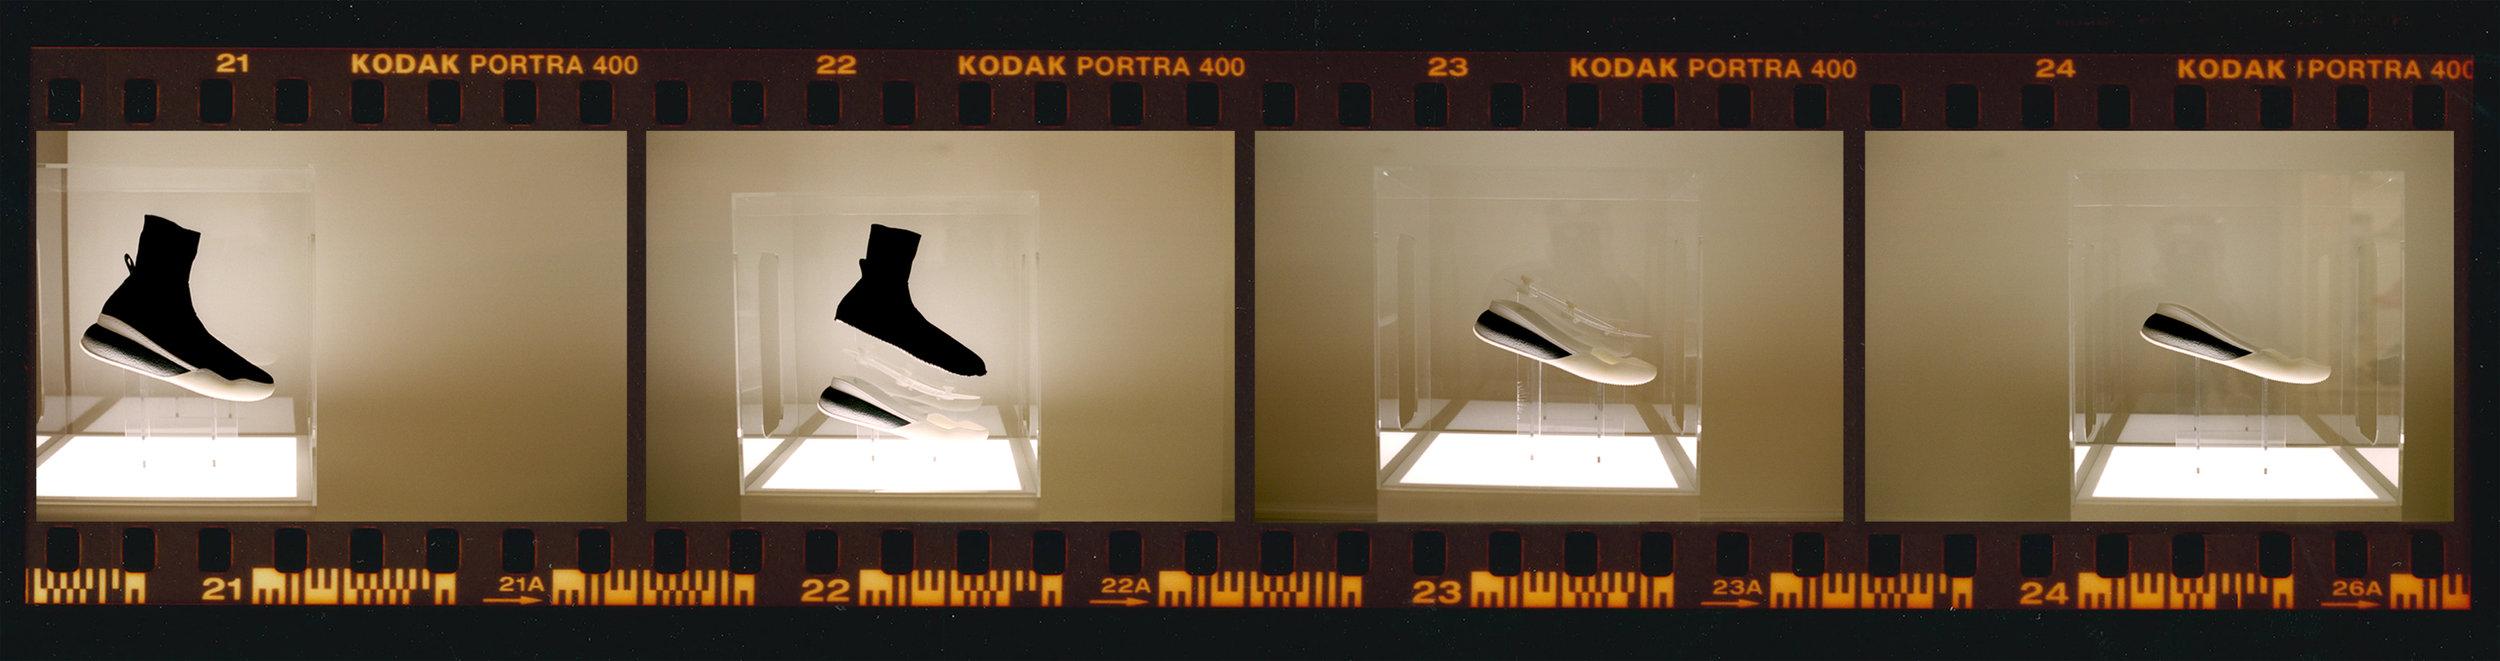 Contact in the loop shoe.jpg